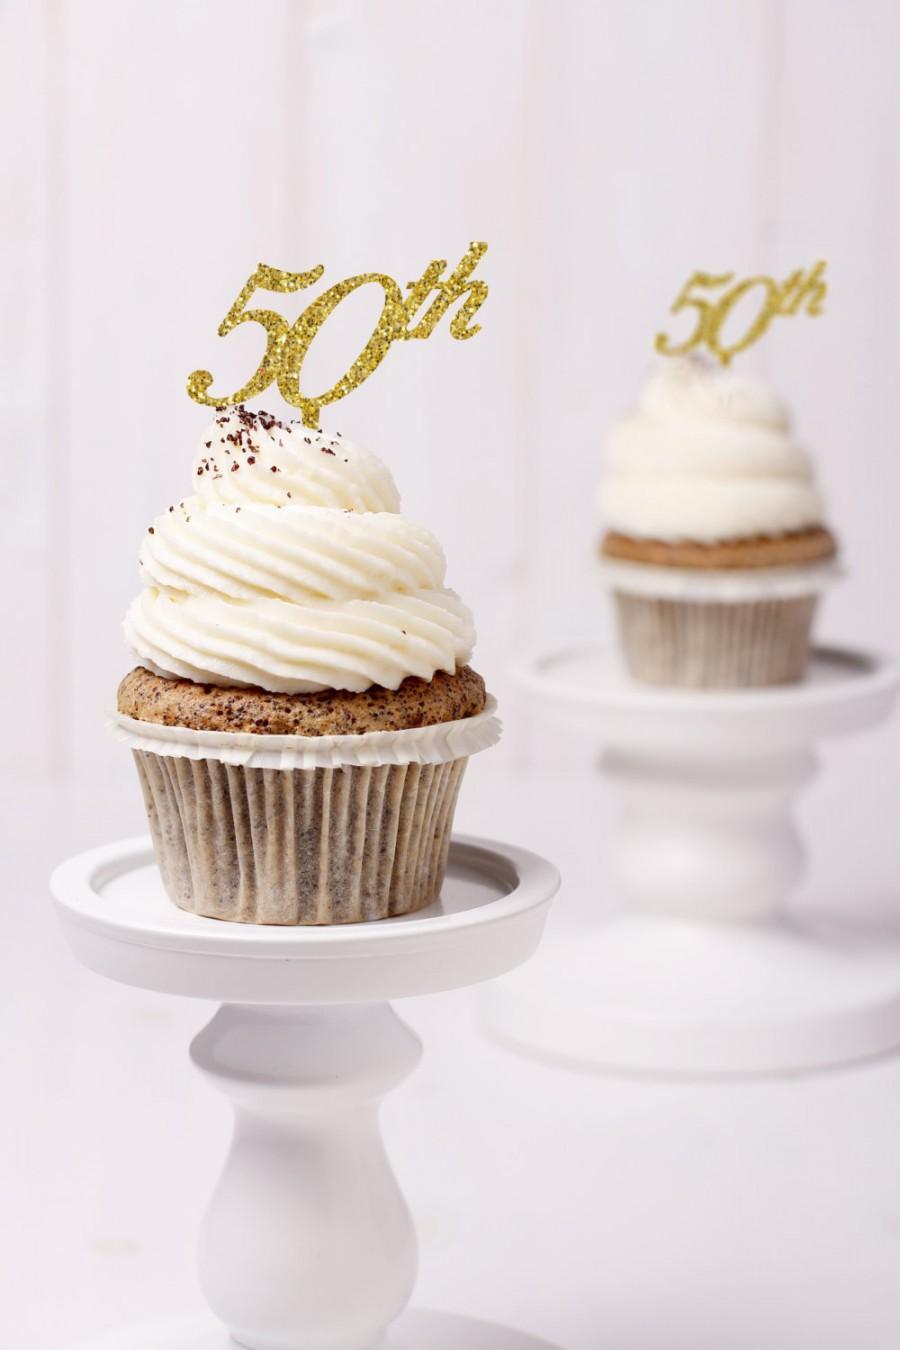 Mariage - Gold Glitter 50th Anniversary Cupcake Topper- (S084)